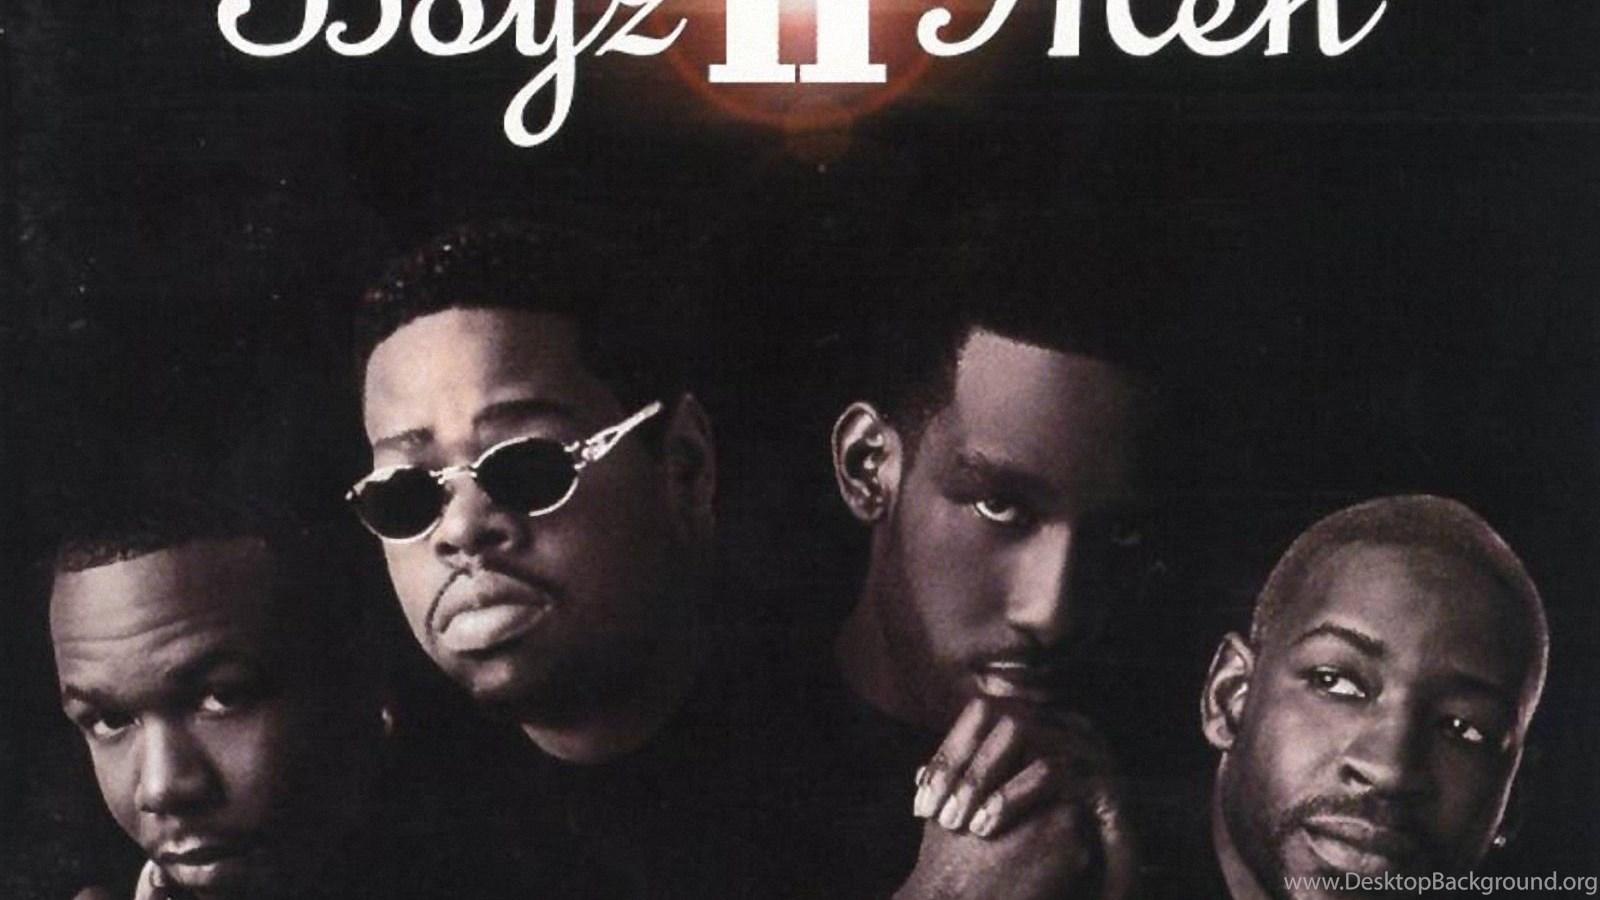 Boyz II Men Cool 1600x1200 Wallpapers 1600x1200 Wallpapers 1600x900